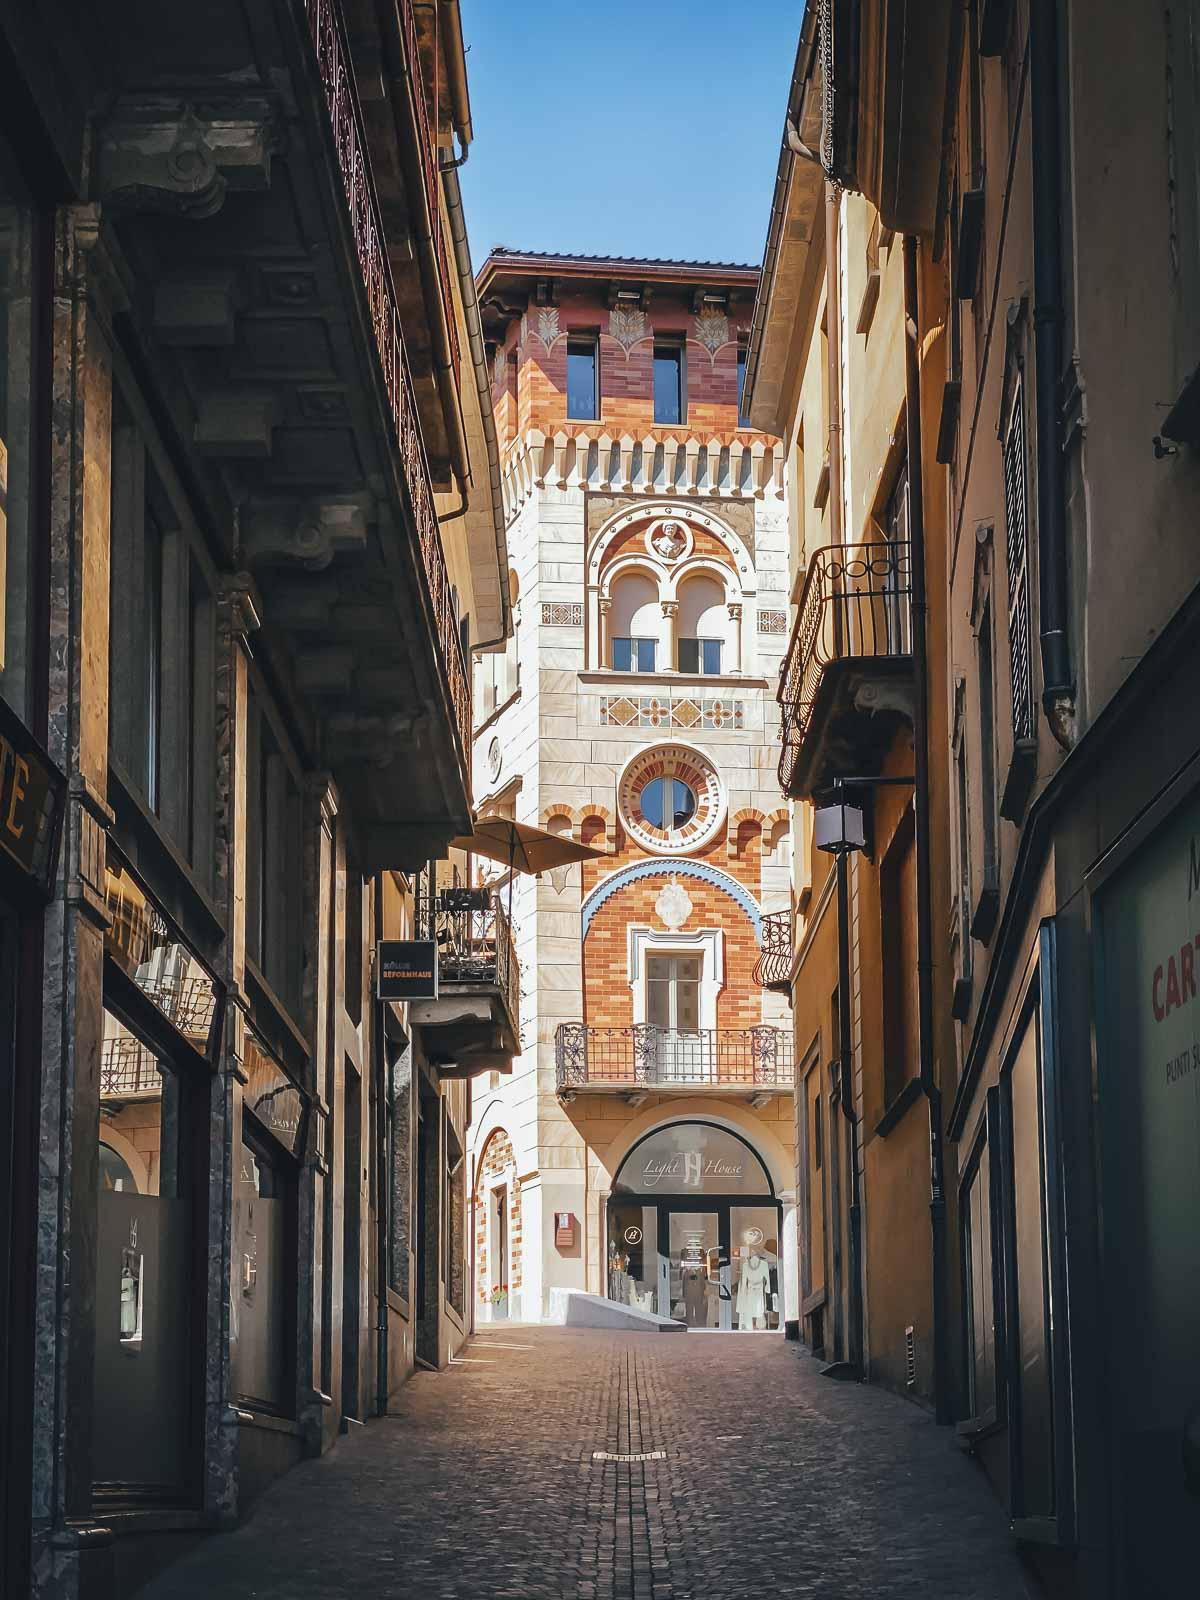 Experience Ticino and Lugano